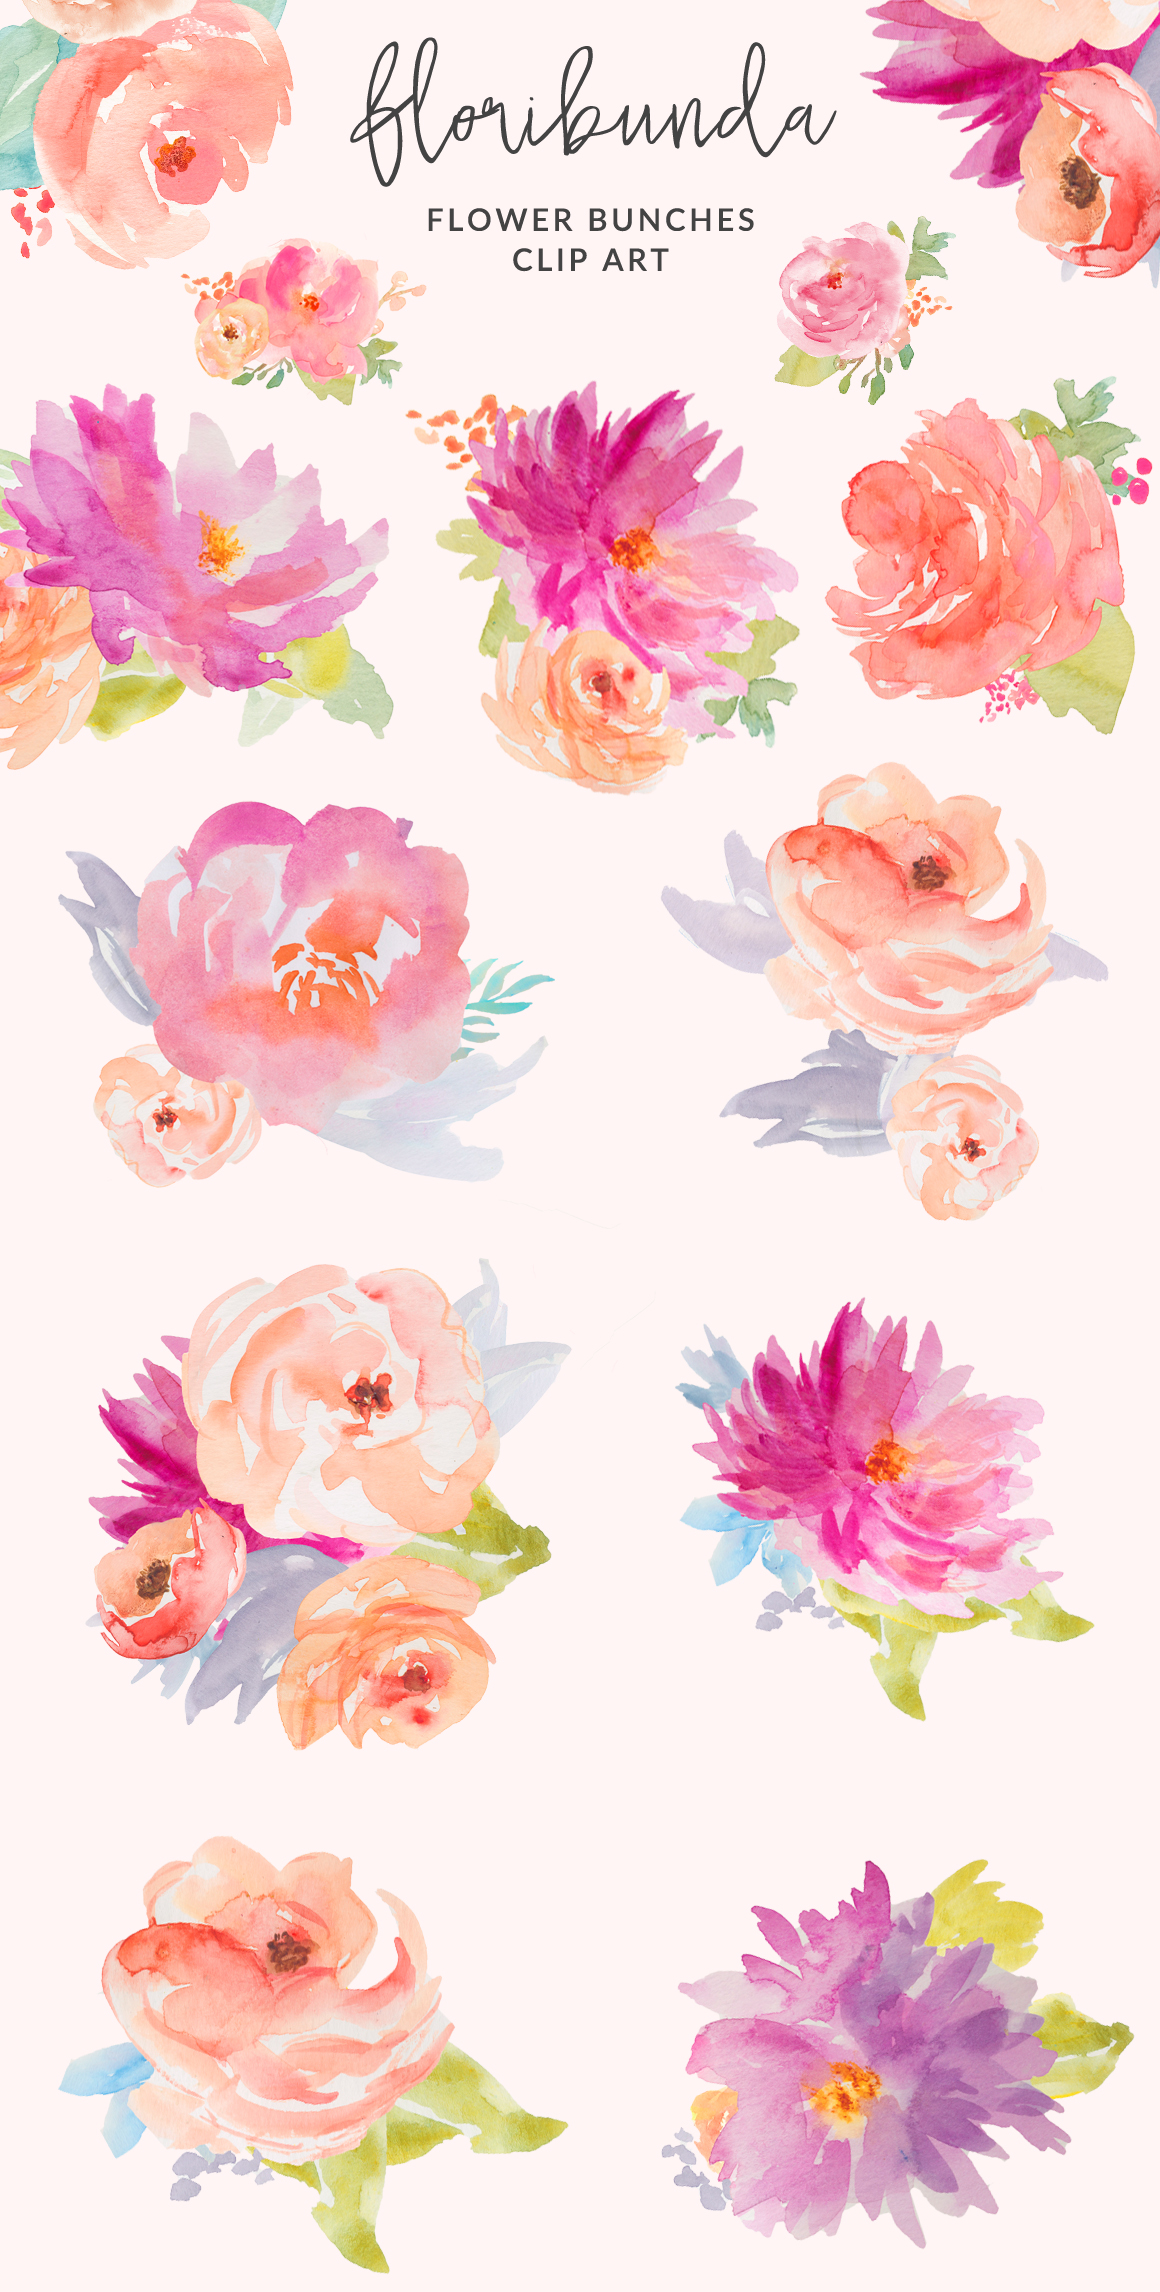 Illustration clipart wedding flower Flower Art Design Clip Floral